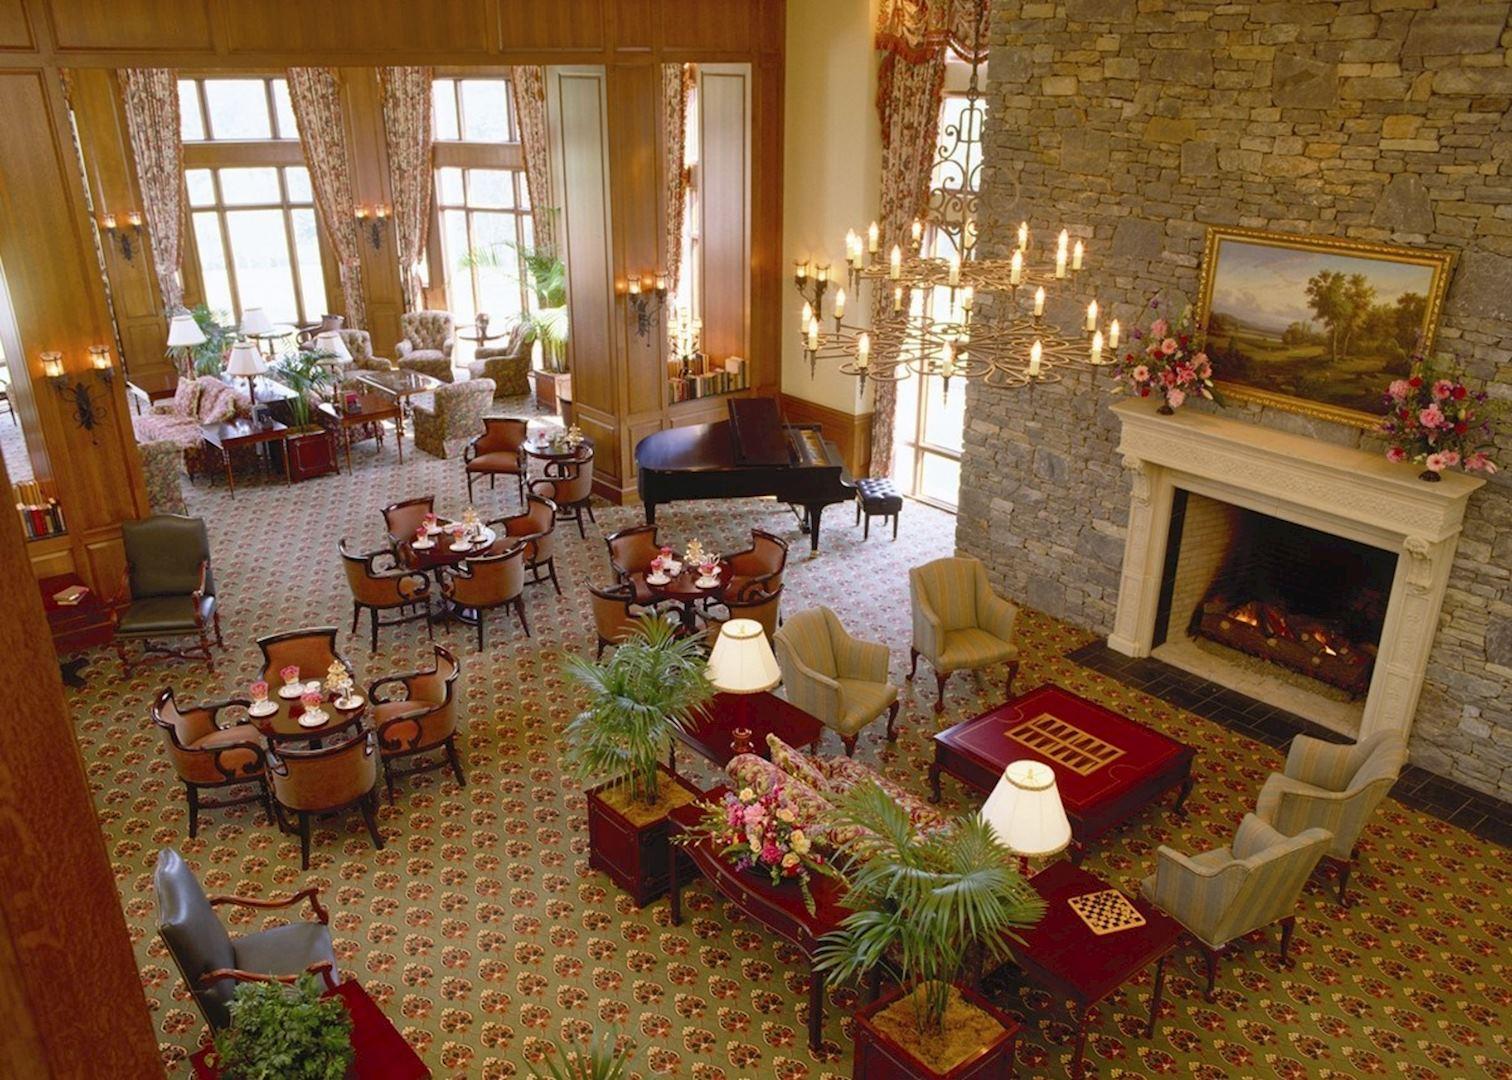 Inn on Biltmore Estate | Hotels in Asheville | Audley Travel